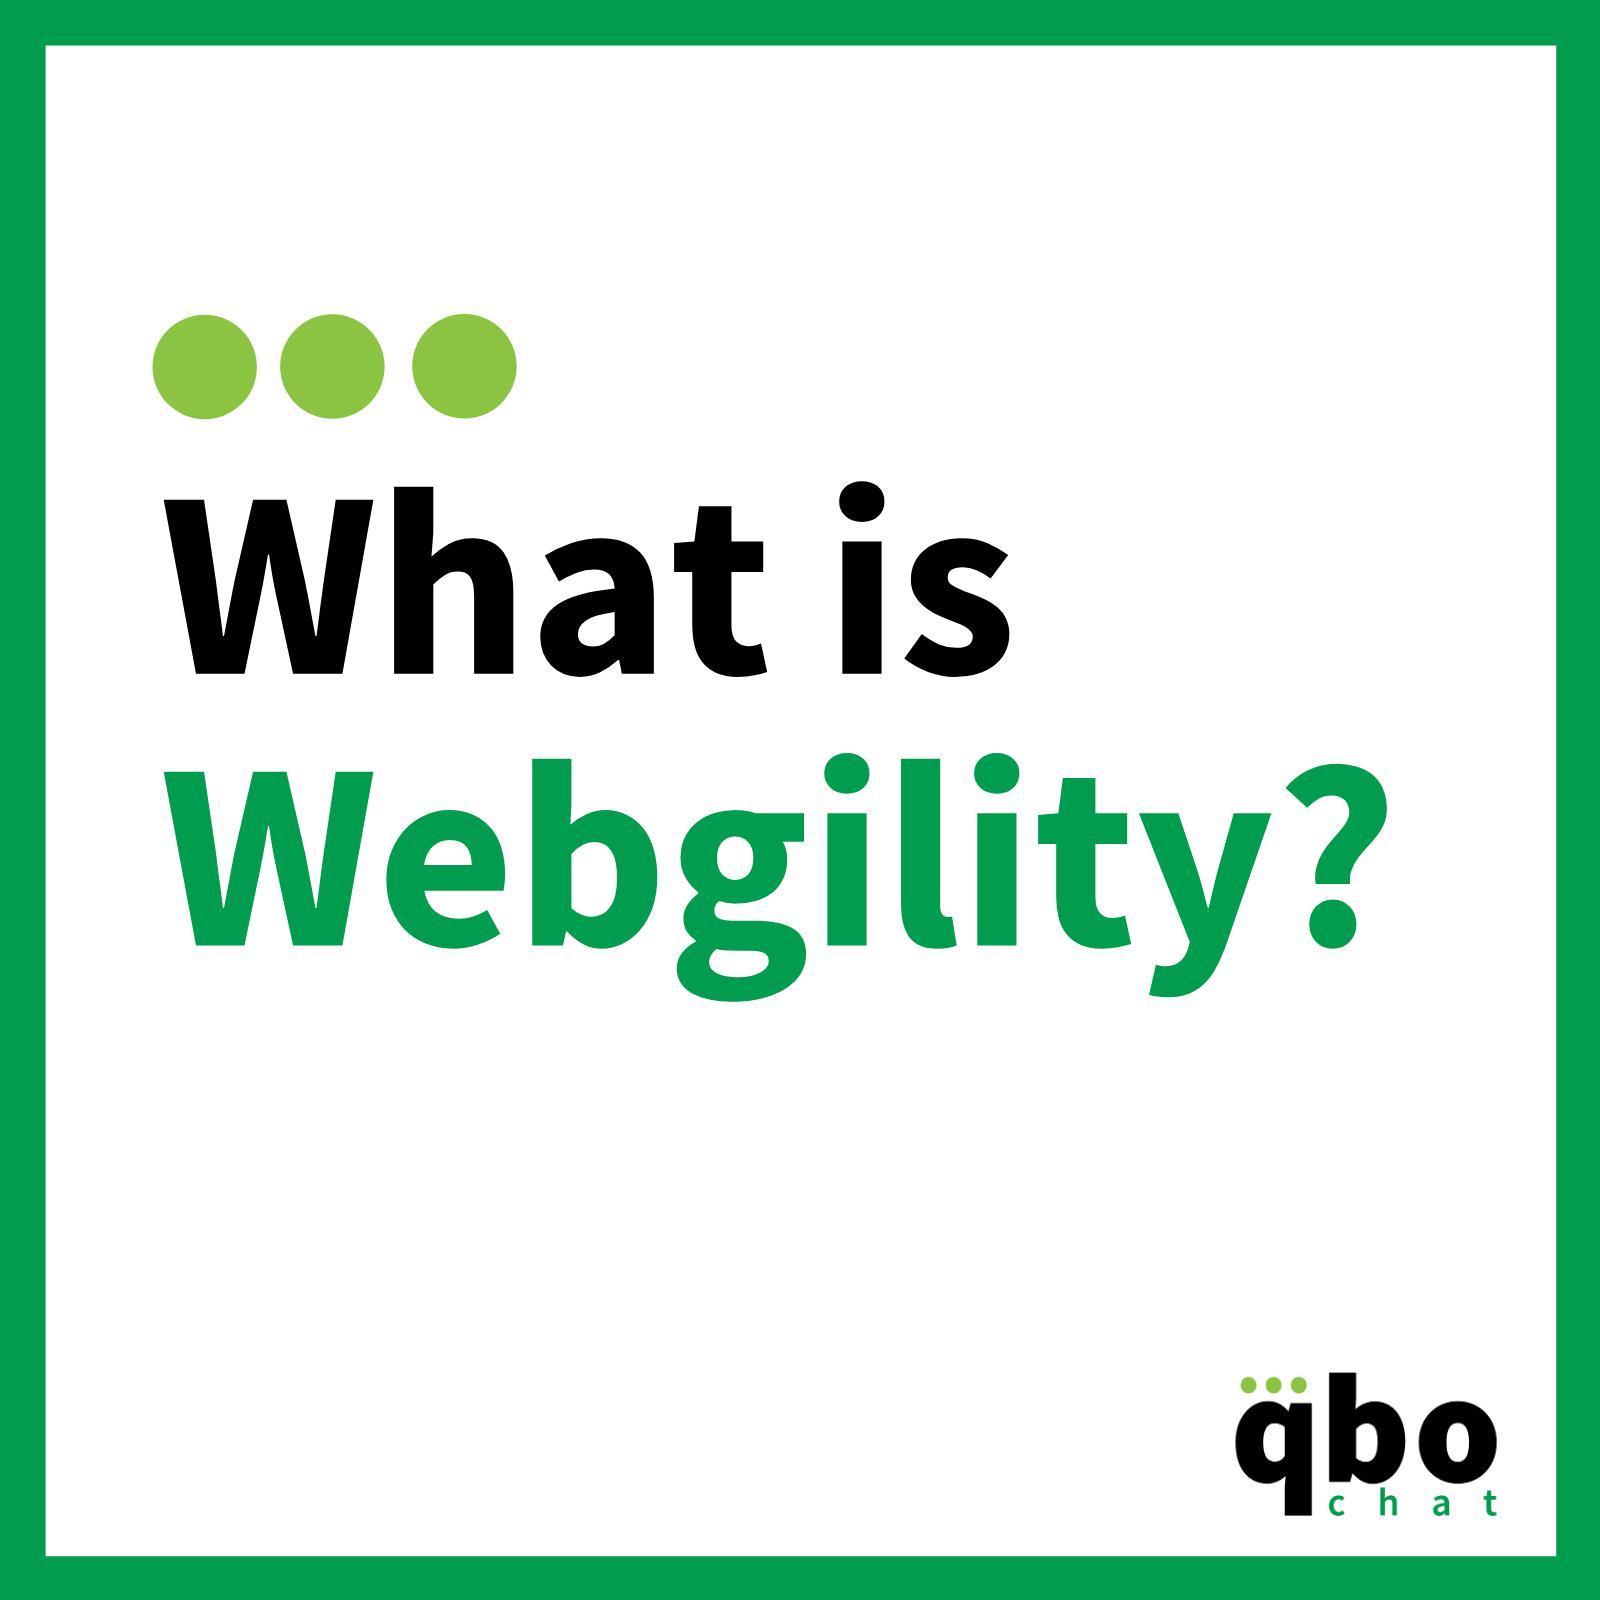 What is Webgility_